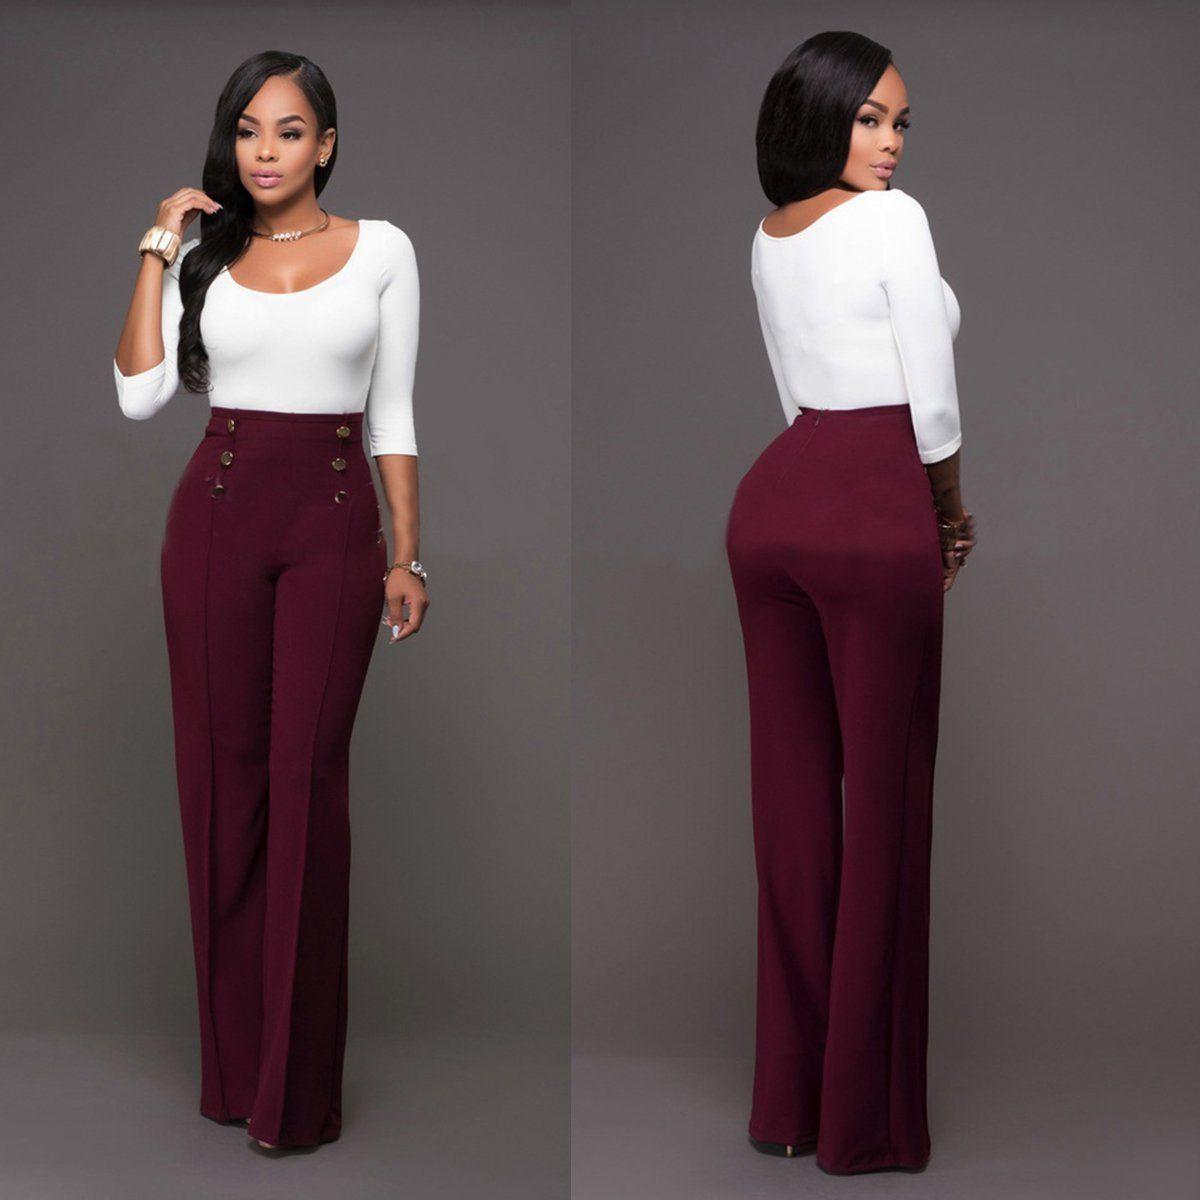 High Waist Button Detail Wide Leg Pant Plus Sizes Available